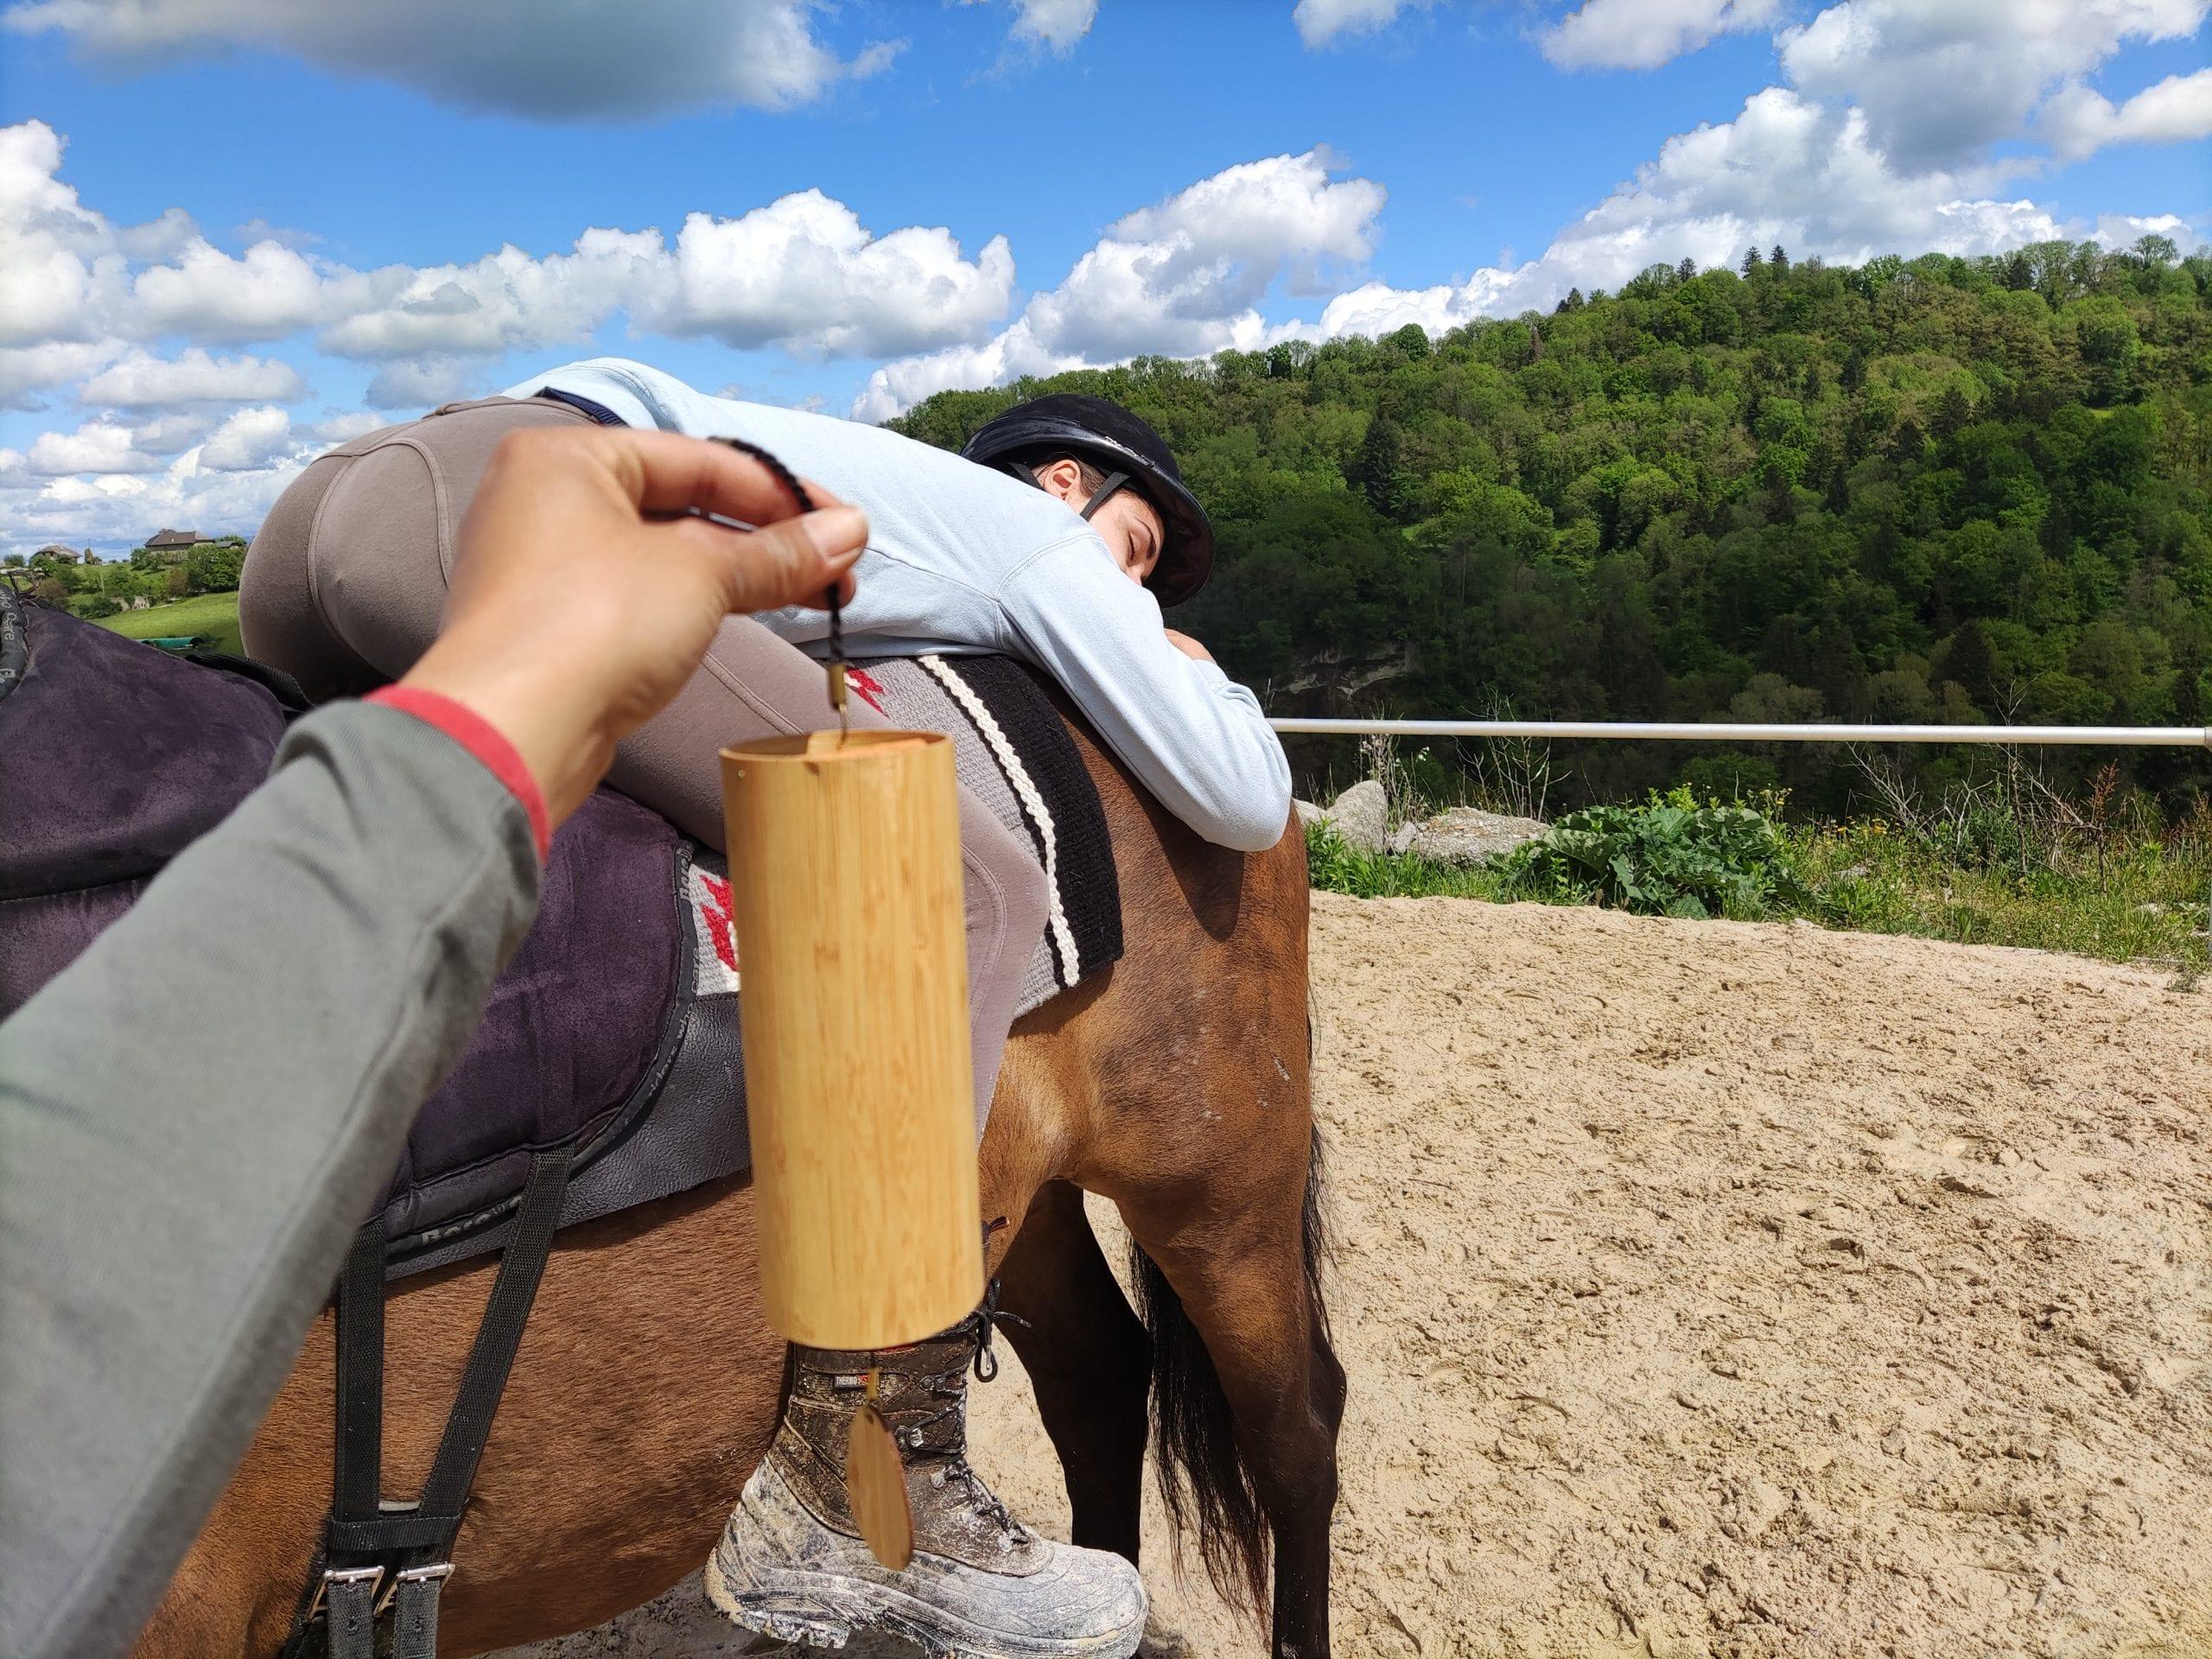 equicoaching-horse-coaching-annecy-aix-les-bains